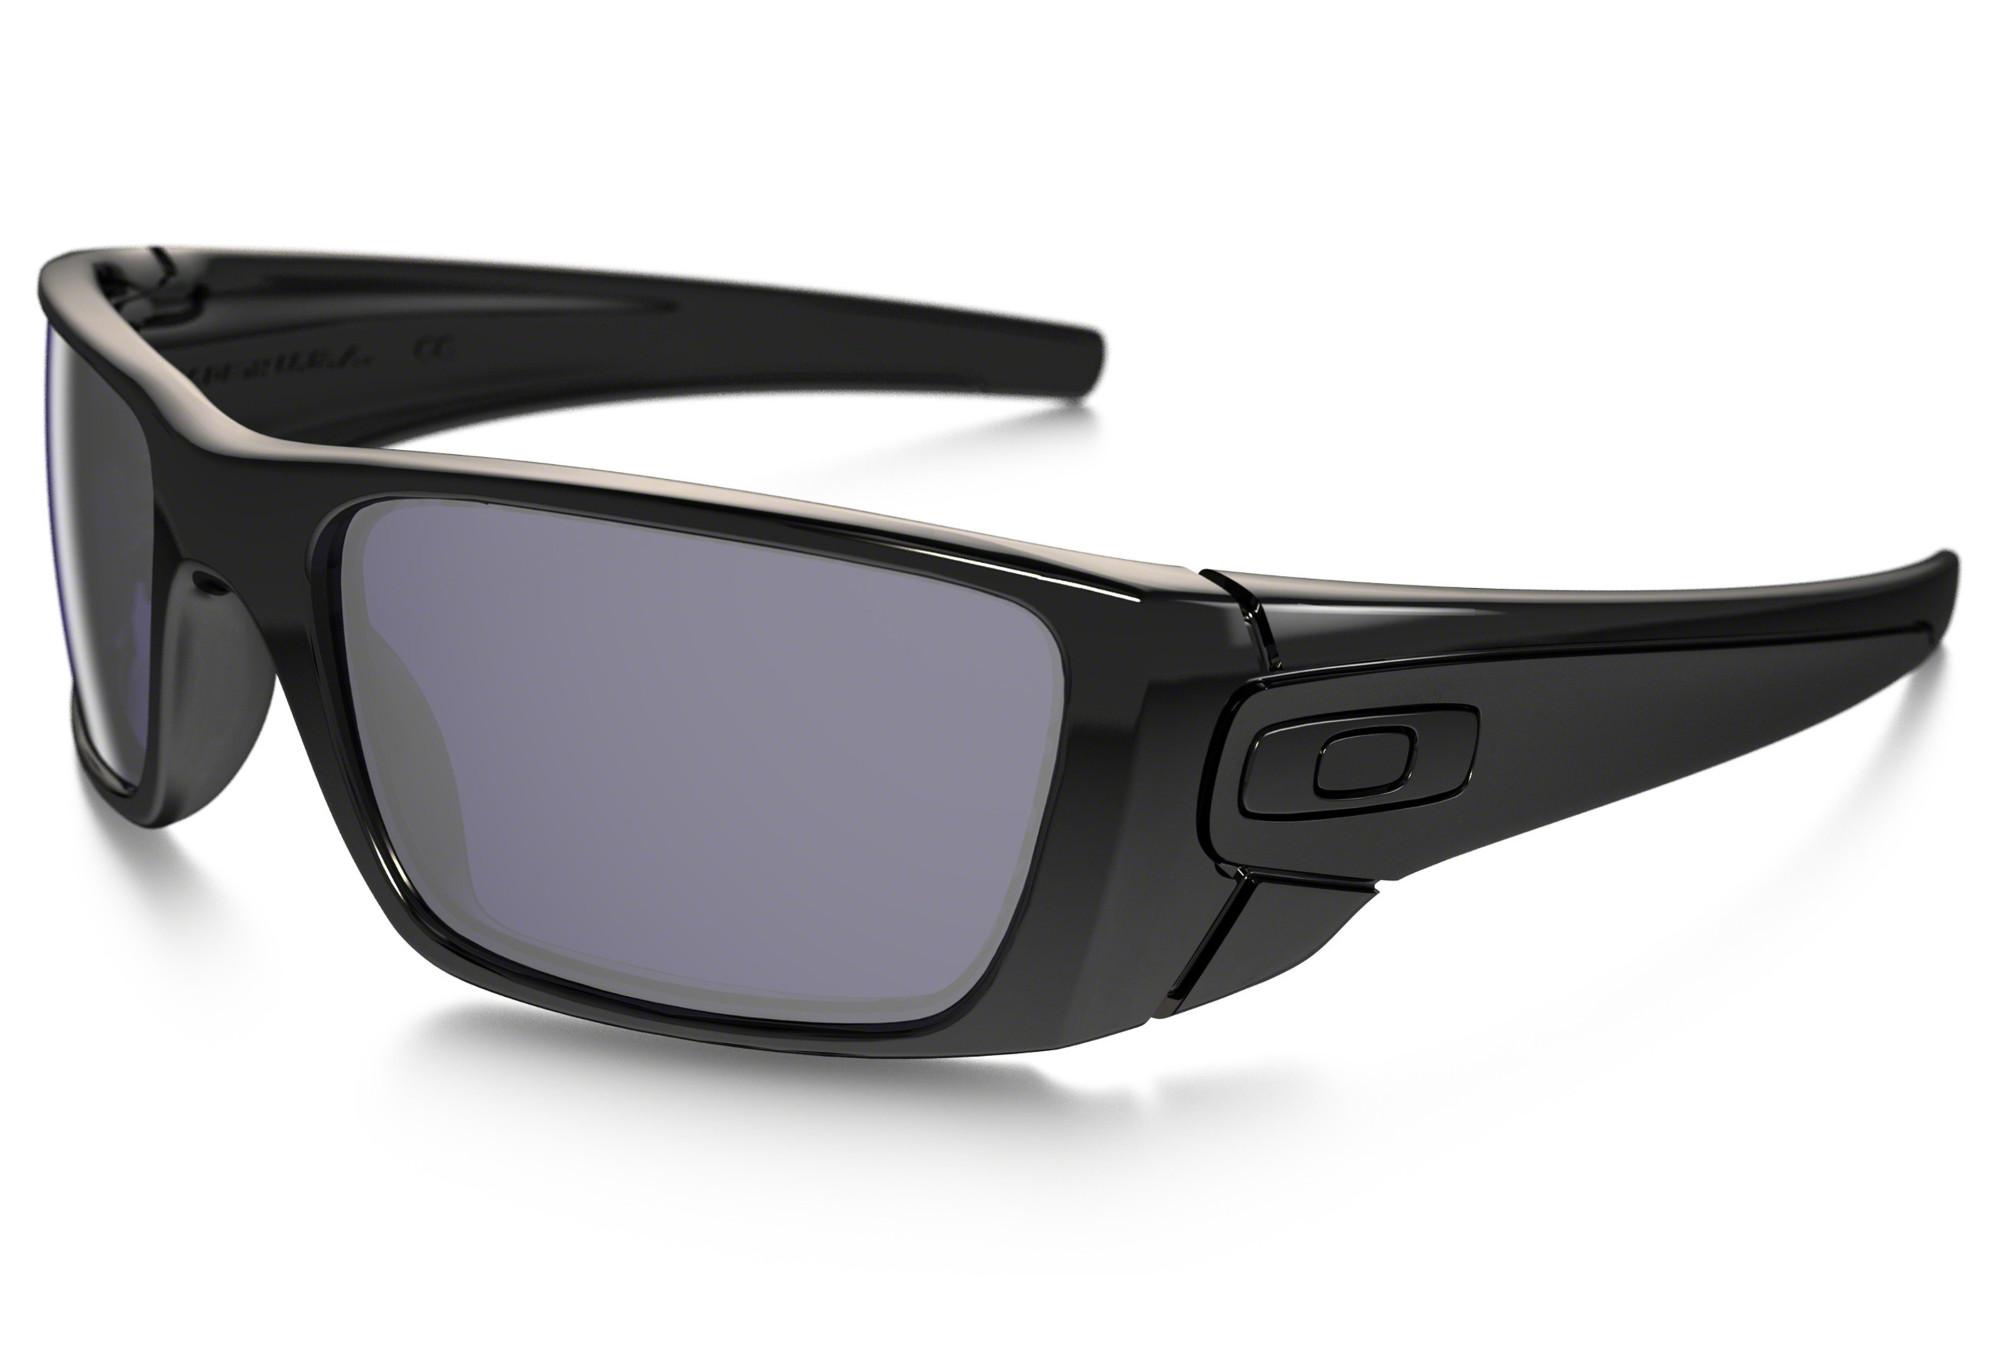 dabc24d8120 OAKLEY Sunglasses Fuel Cell Polished Blak Warm Grey Ref OO9096-01 ...